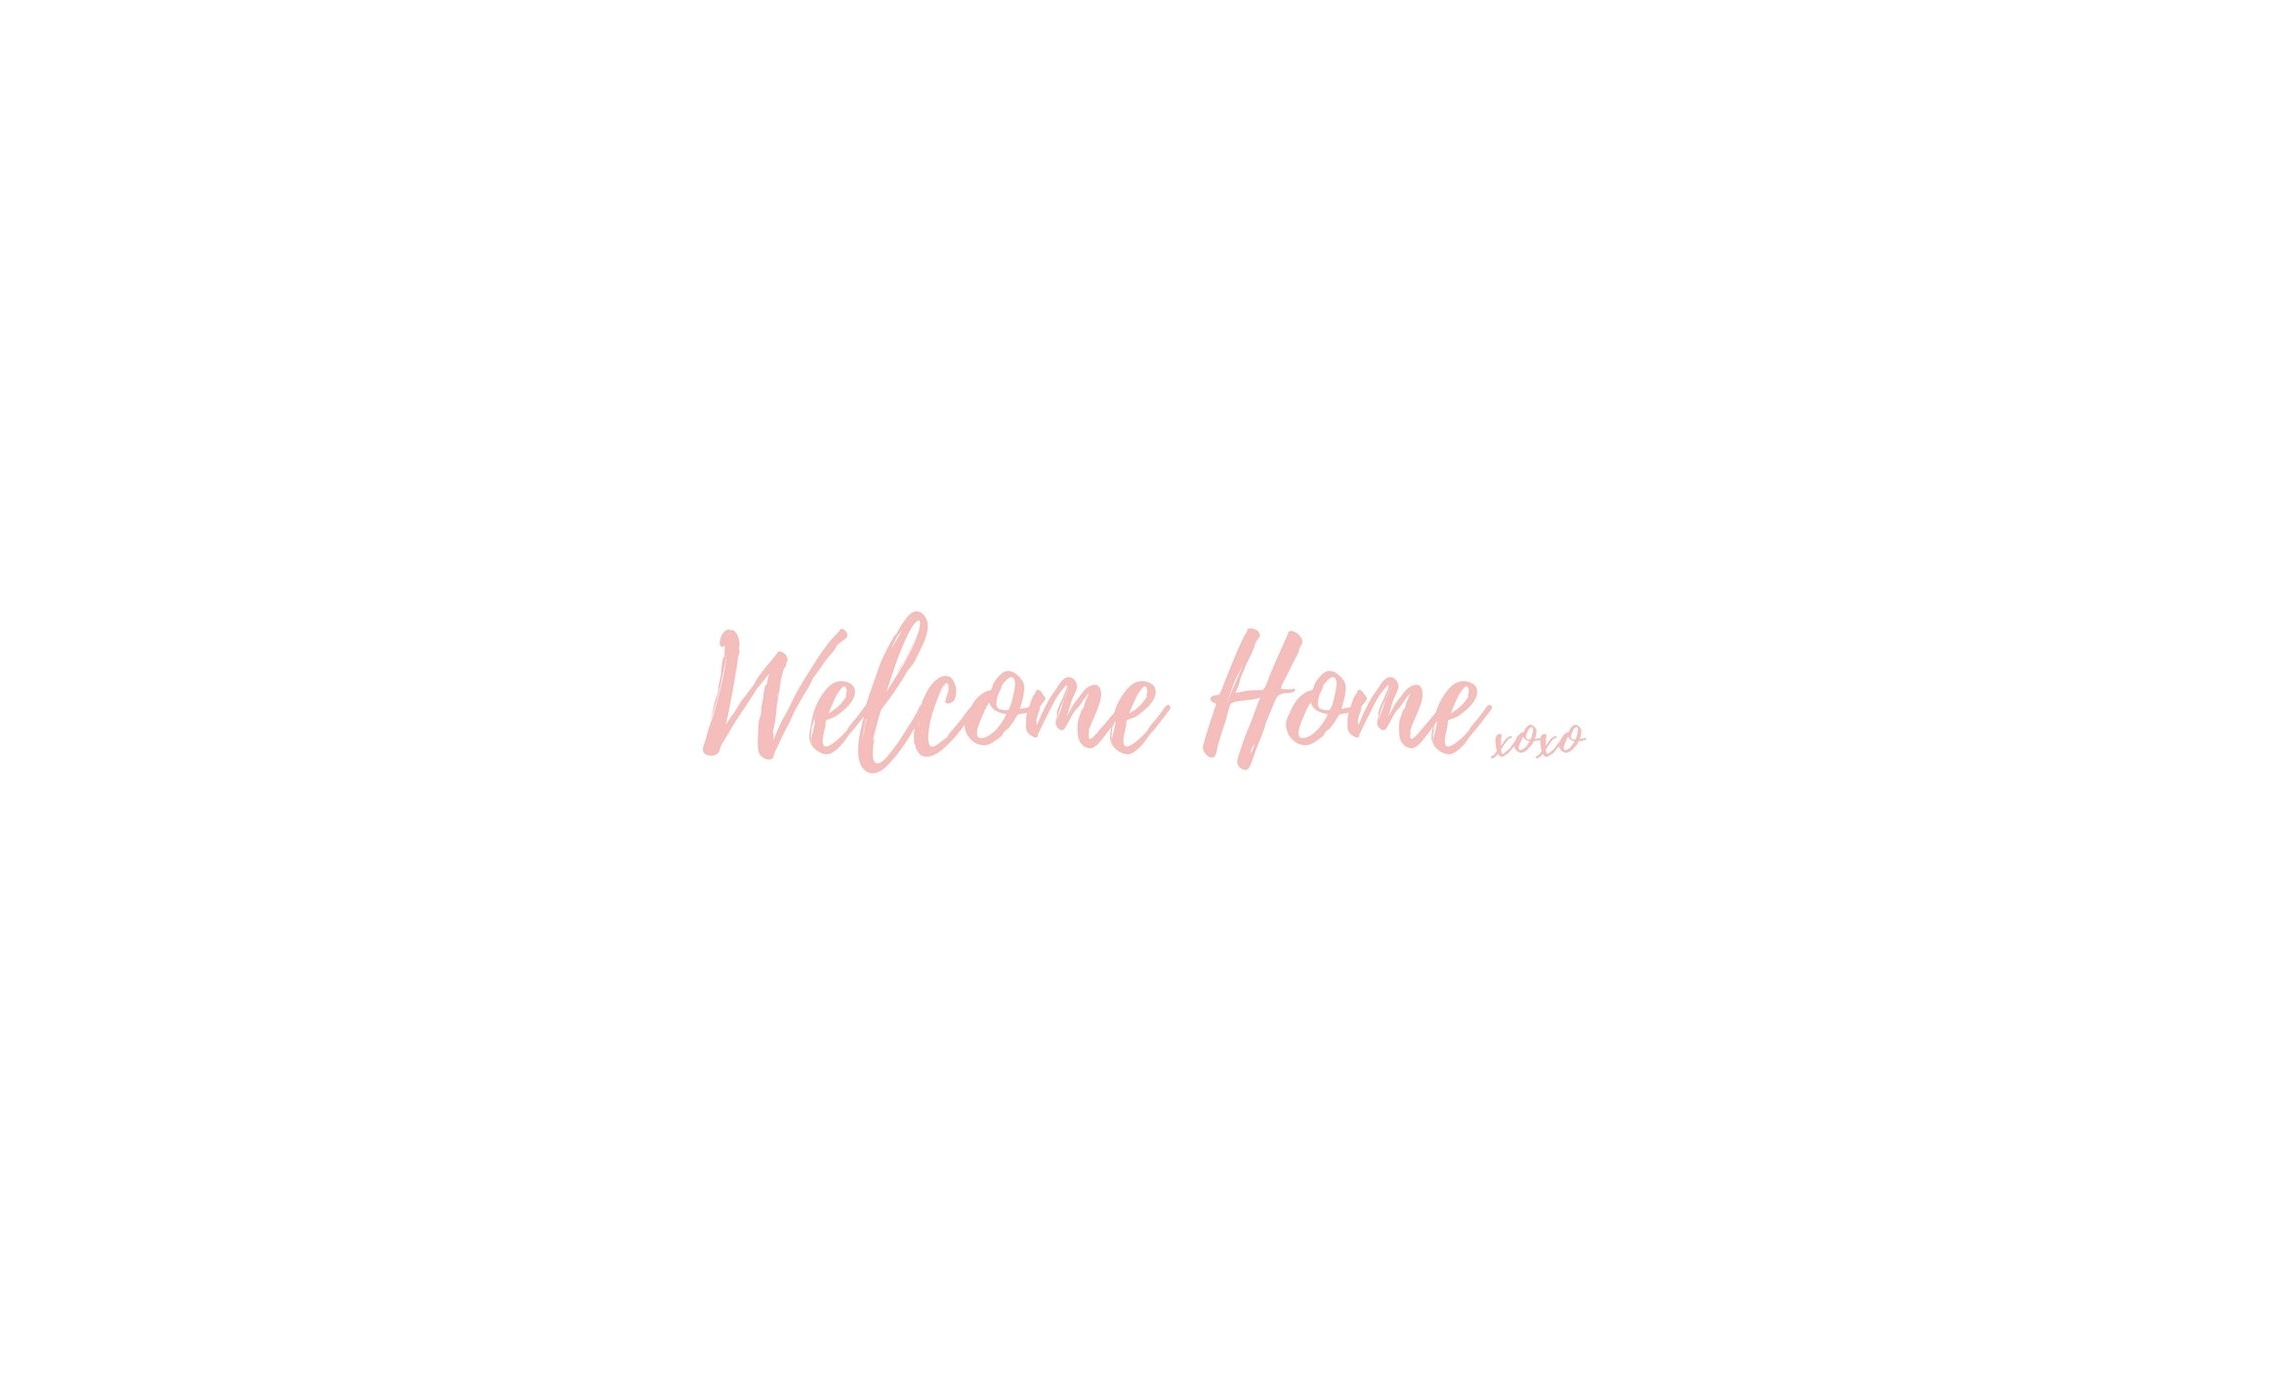 Welcome Home... copy.jpg